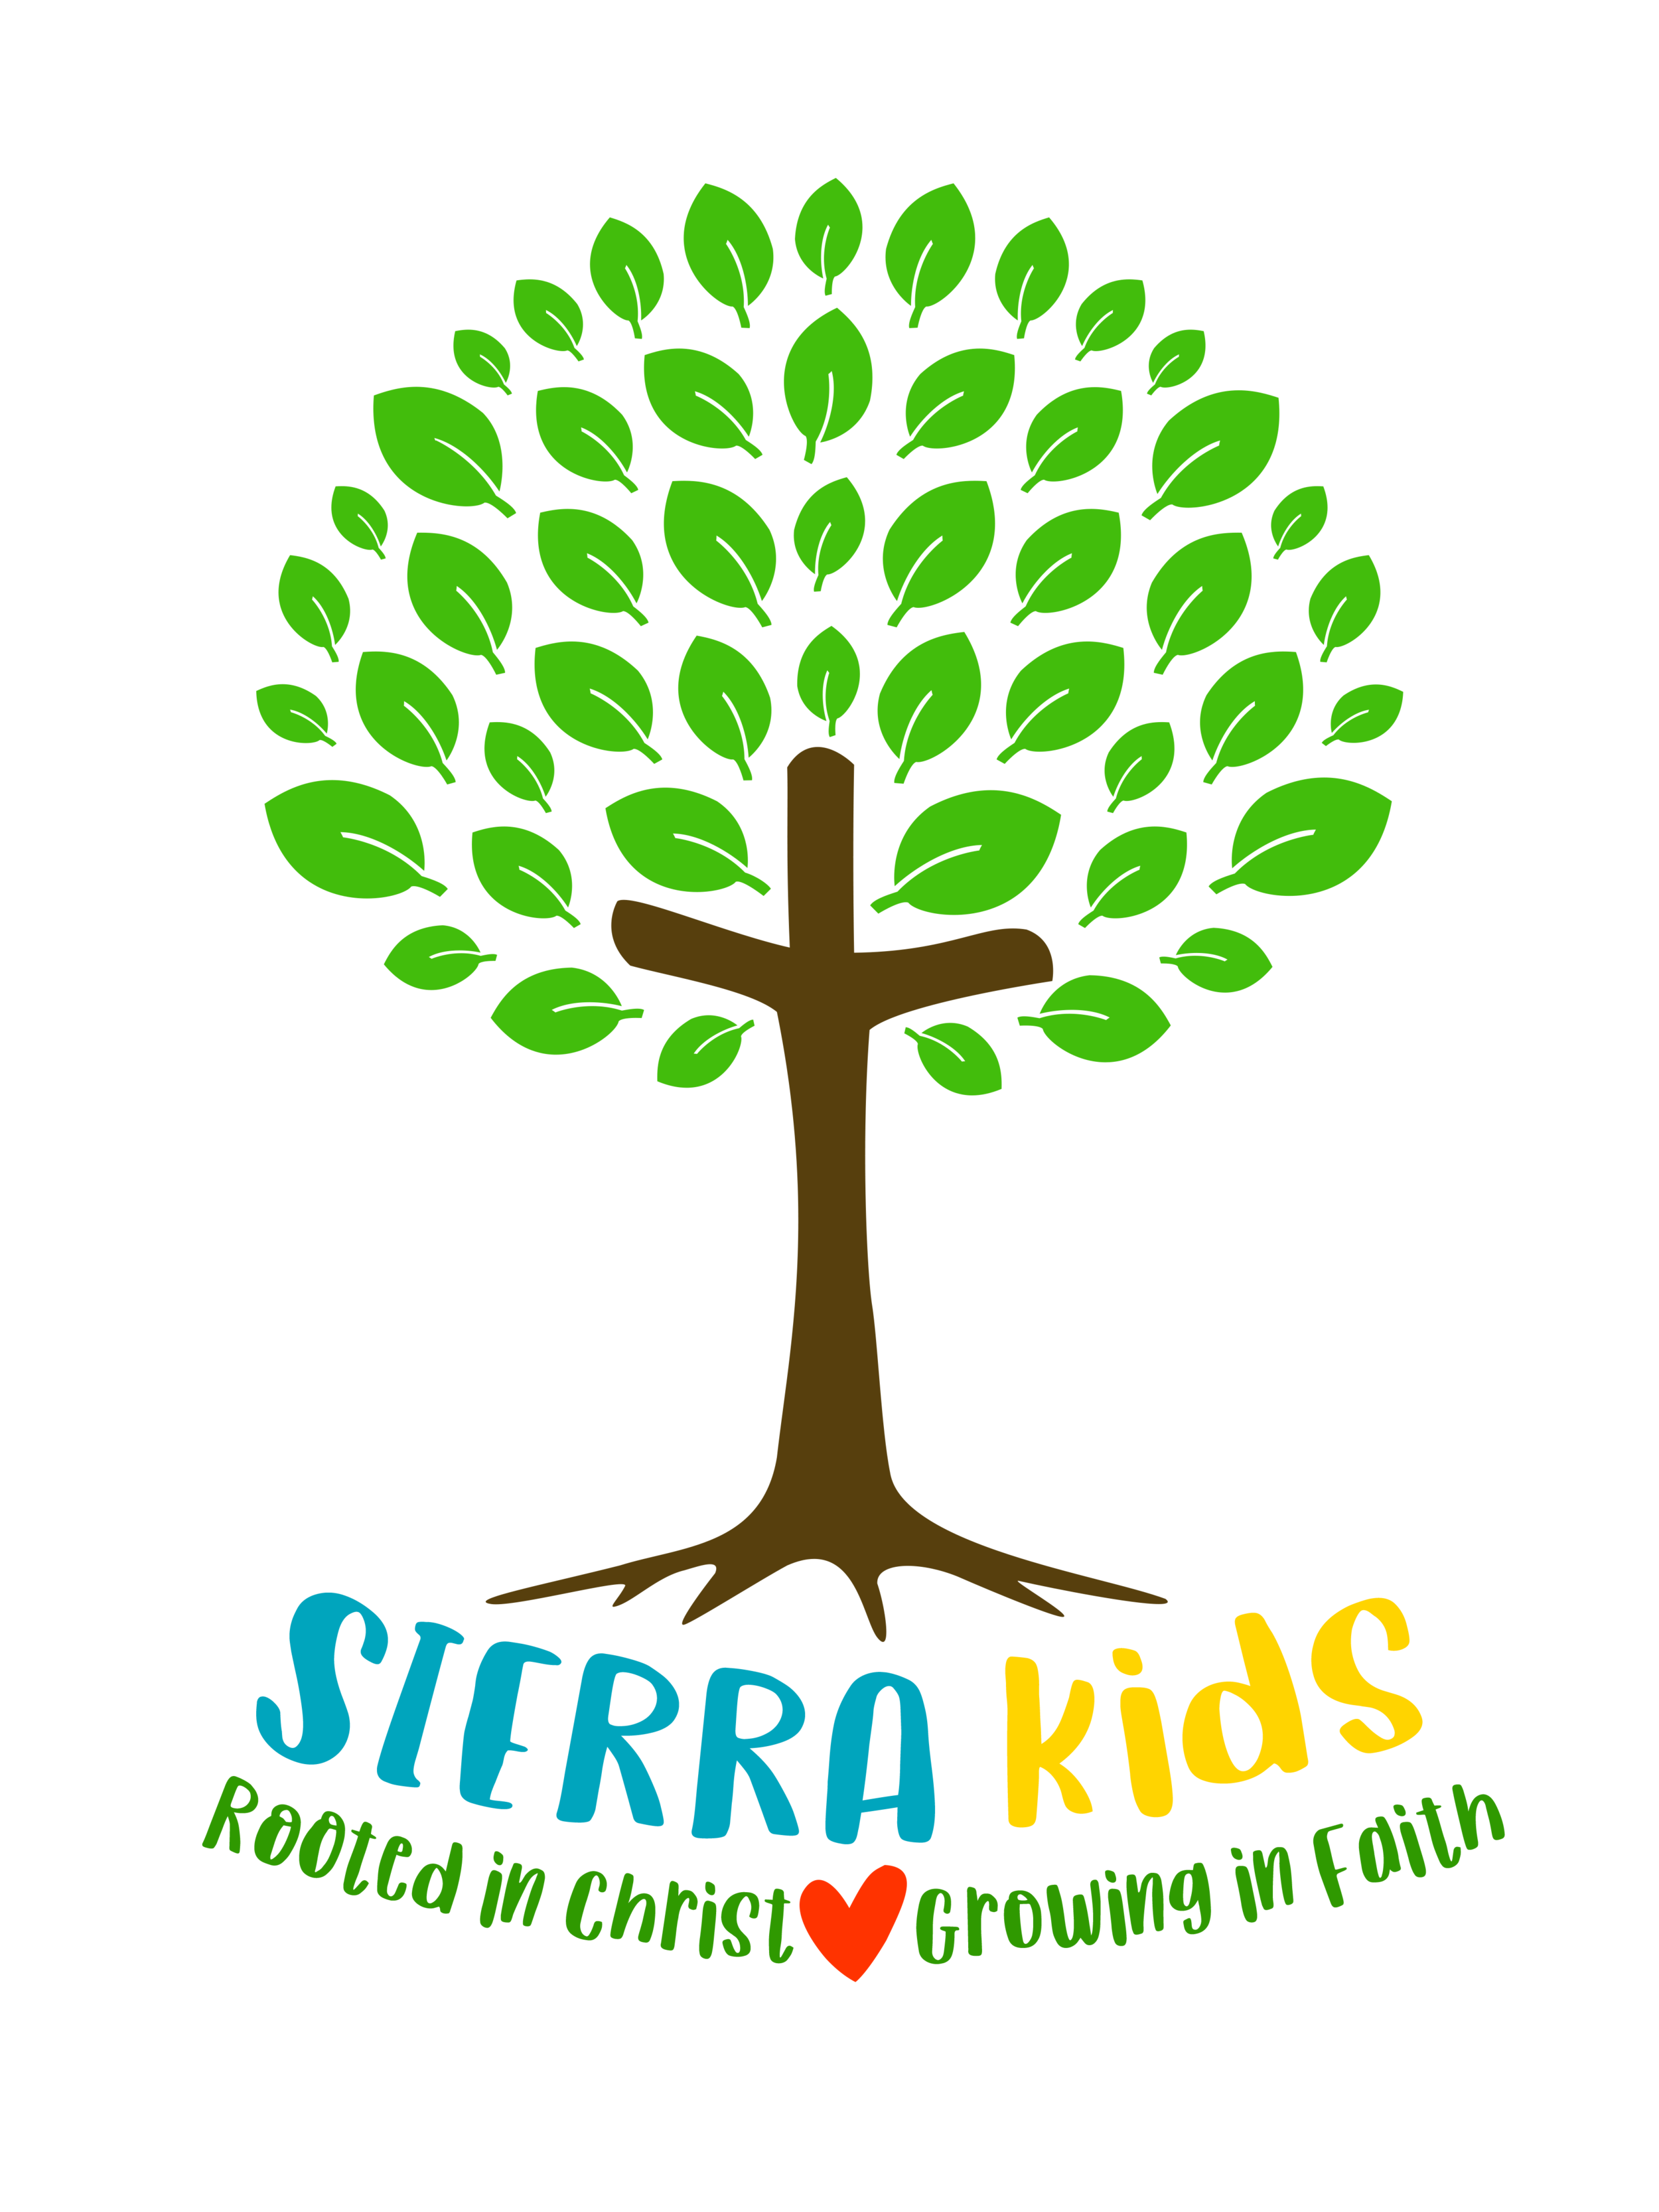 SierraKidsLogo_final.png